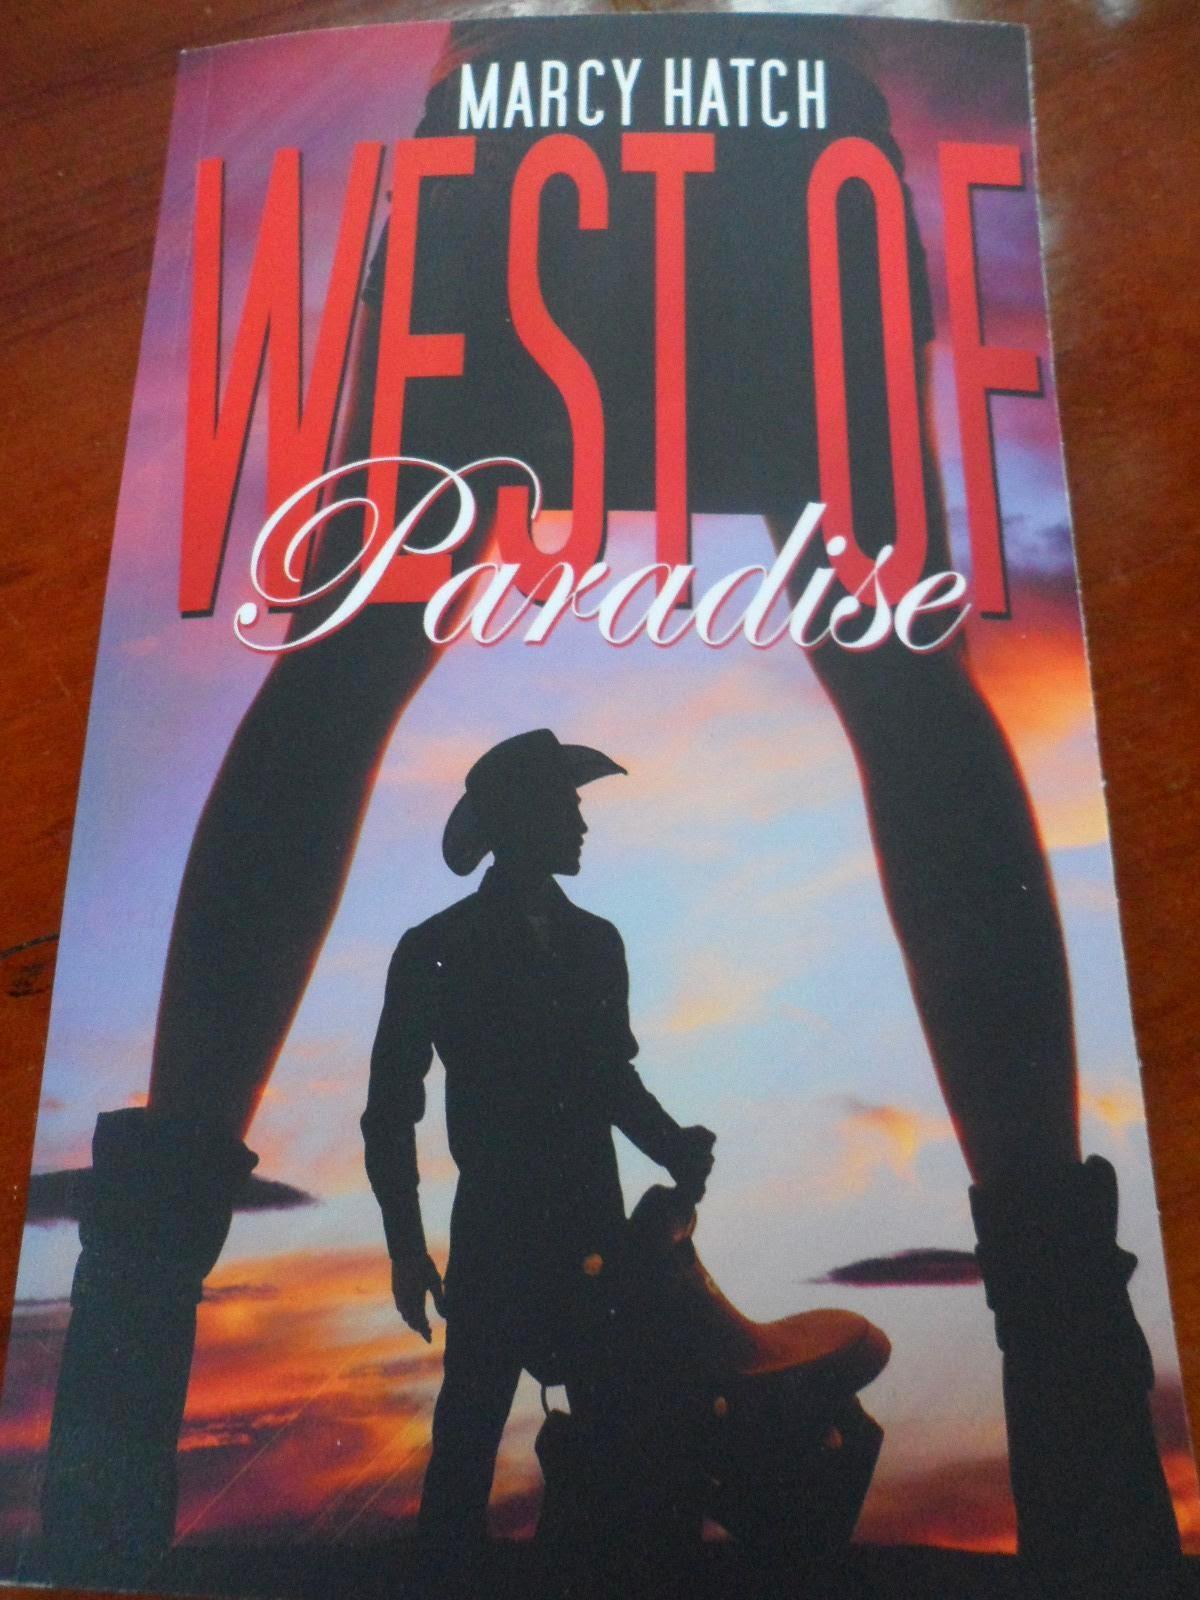 http://www.amazon.com/West-Paradise-Marcy-Hatch-ebook/dp/B00IZNUPTU/ref=sr_1_1?ie=UTF8&qid=1395770354&sr=8-1&keywords=west+of+paradise